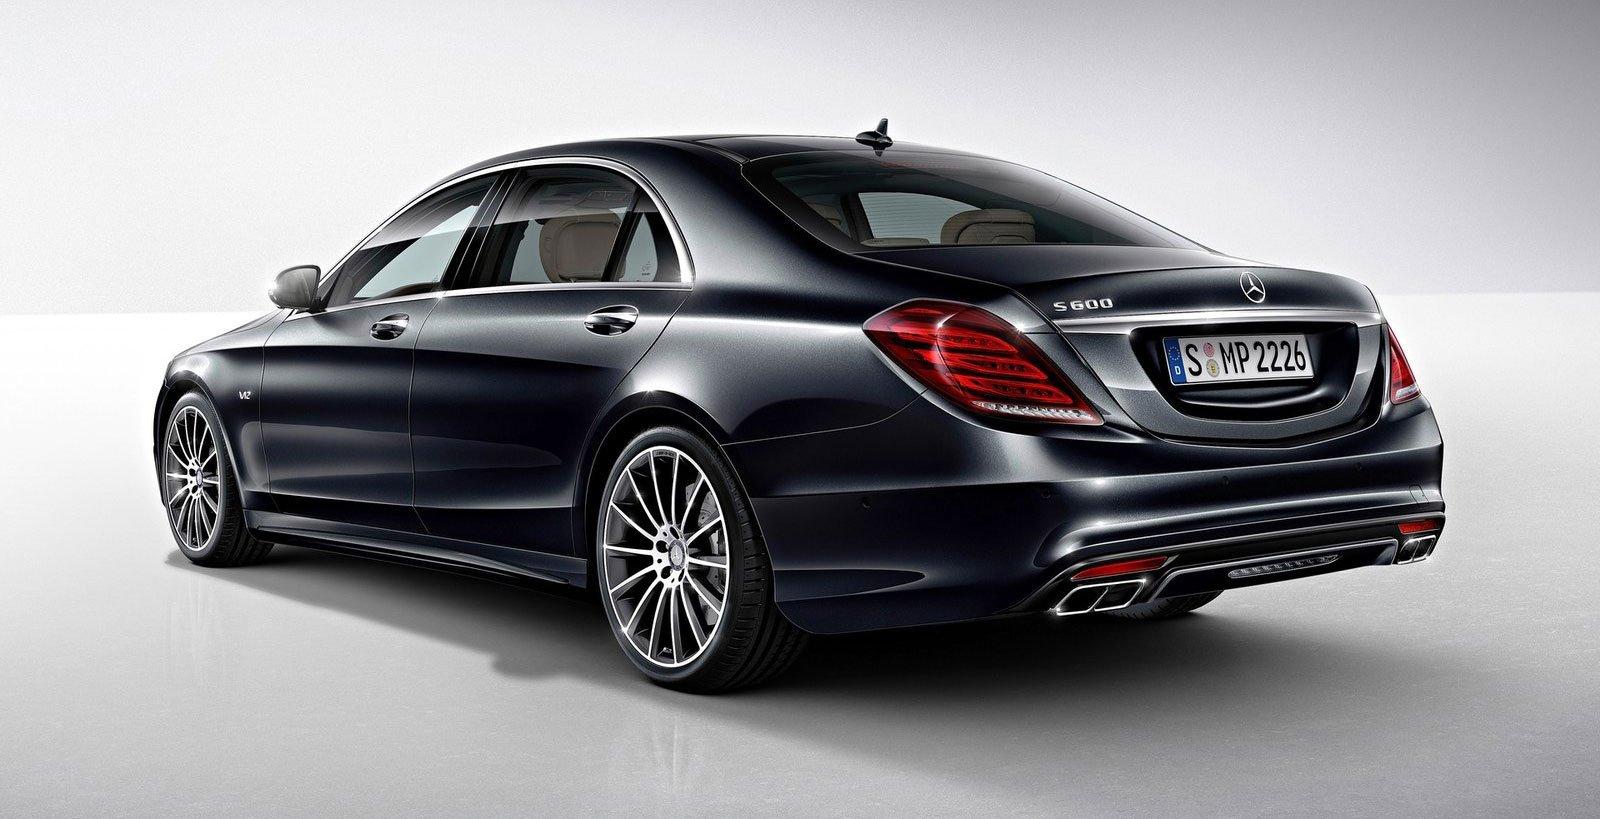 Mercedes benz s600 debuts in detroit the v12 w222 for Mercedes benz flagship car